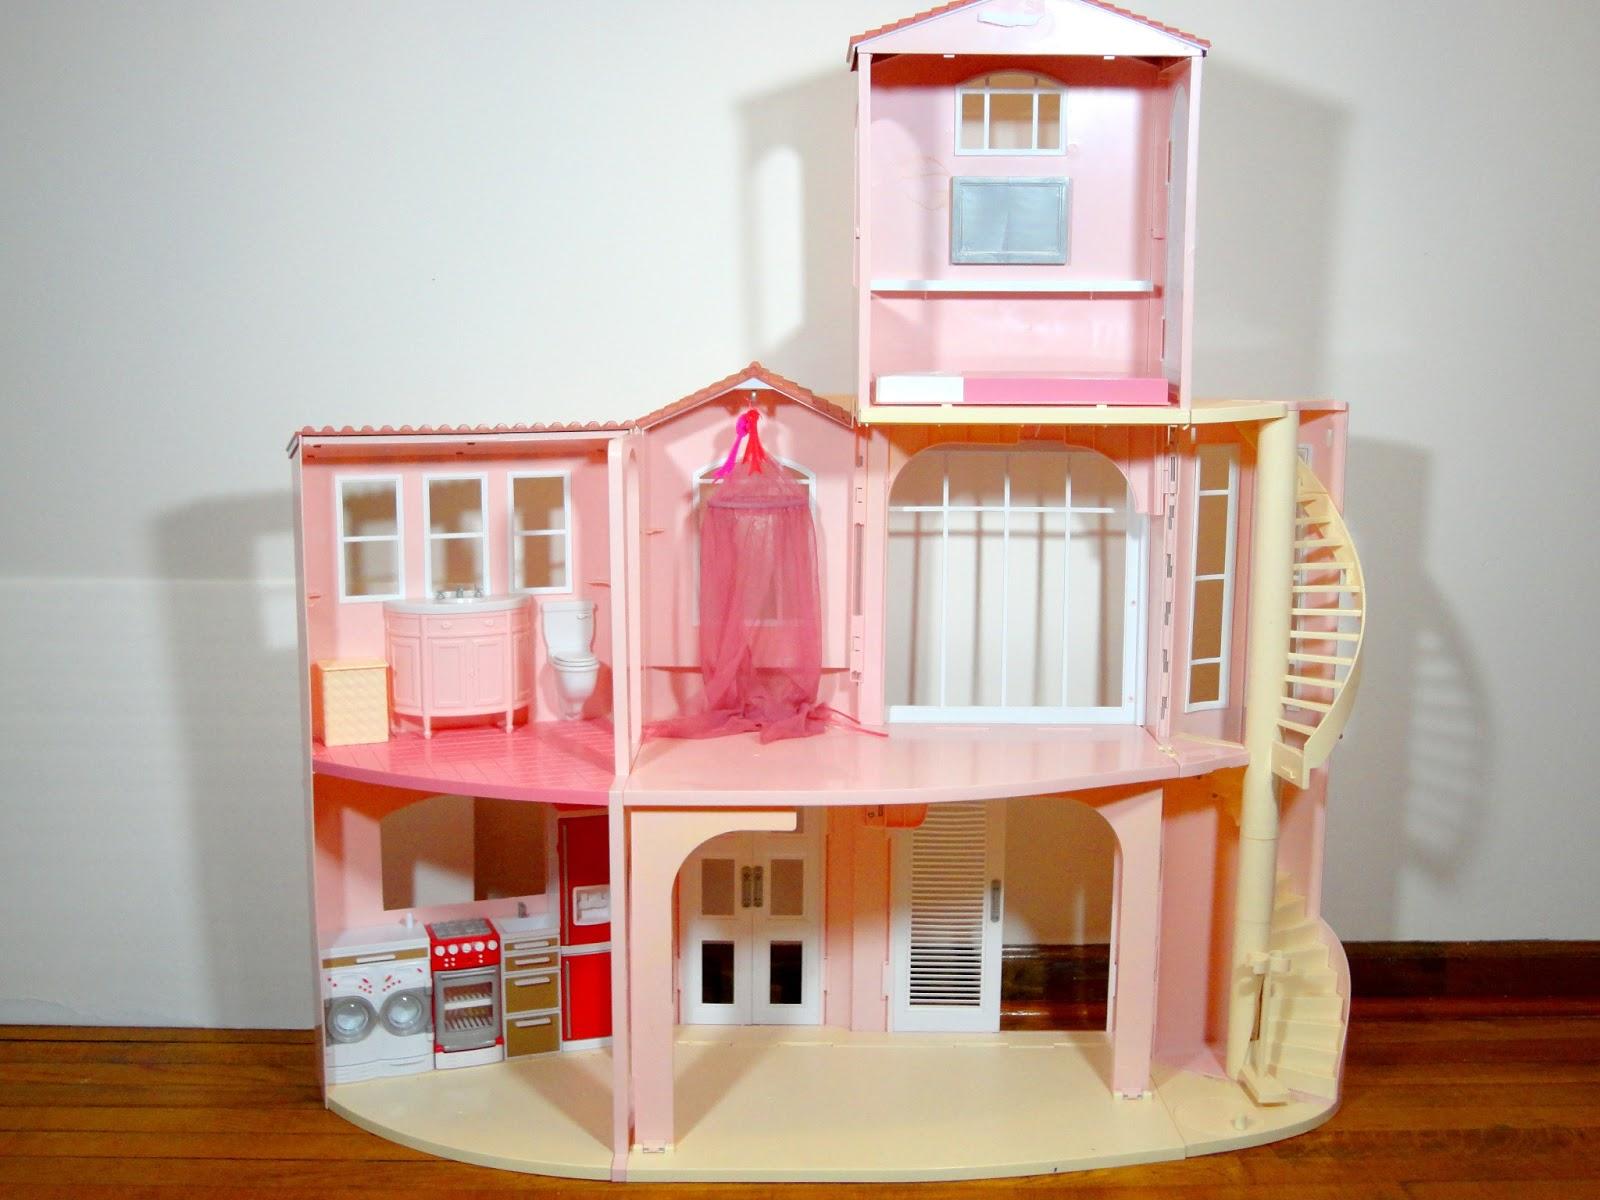 Eeeeek!! The Barbie 3 Story Dream House - The Waverlys